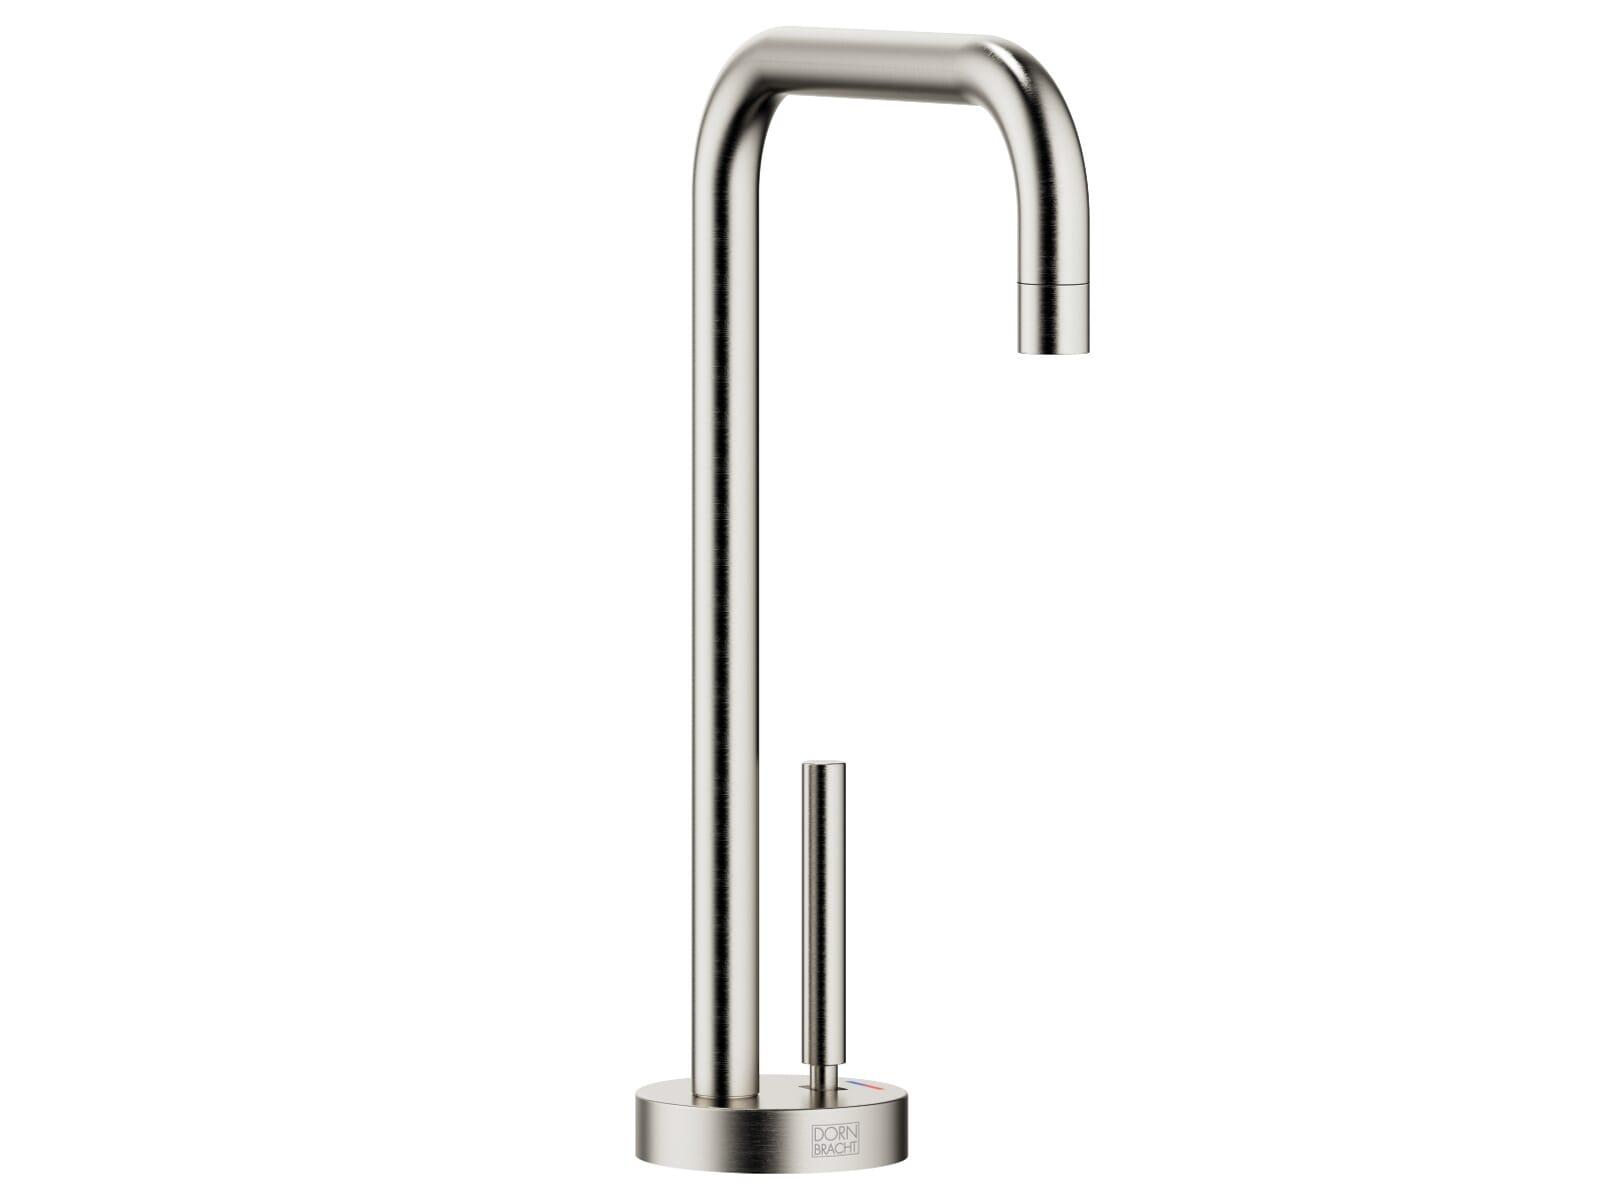 Dornbracht Meta.02 Hot & Cold Water Dispenser Platin Matt 17 861 625-06 Hochdruckarmatur